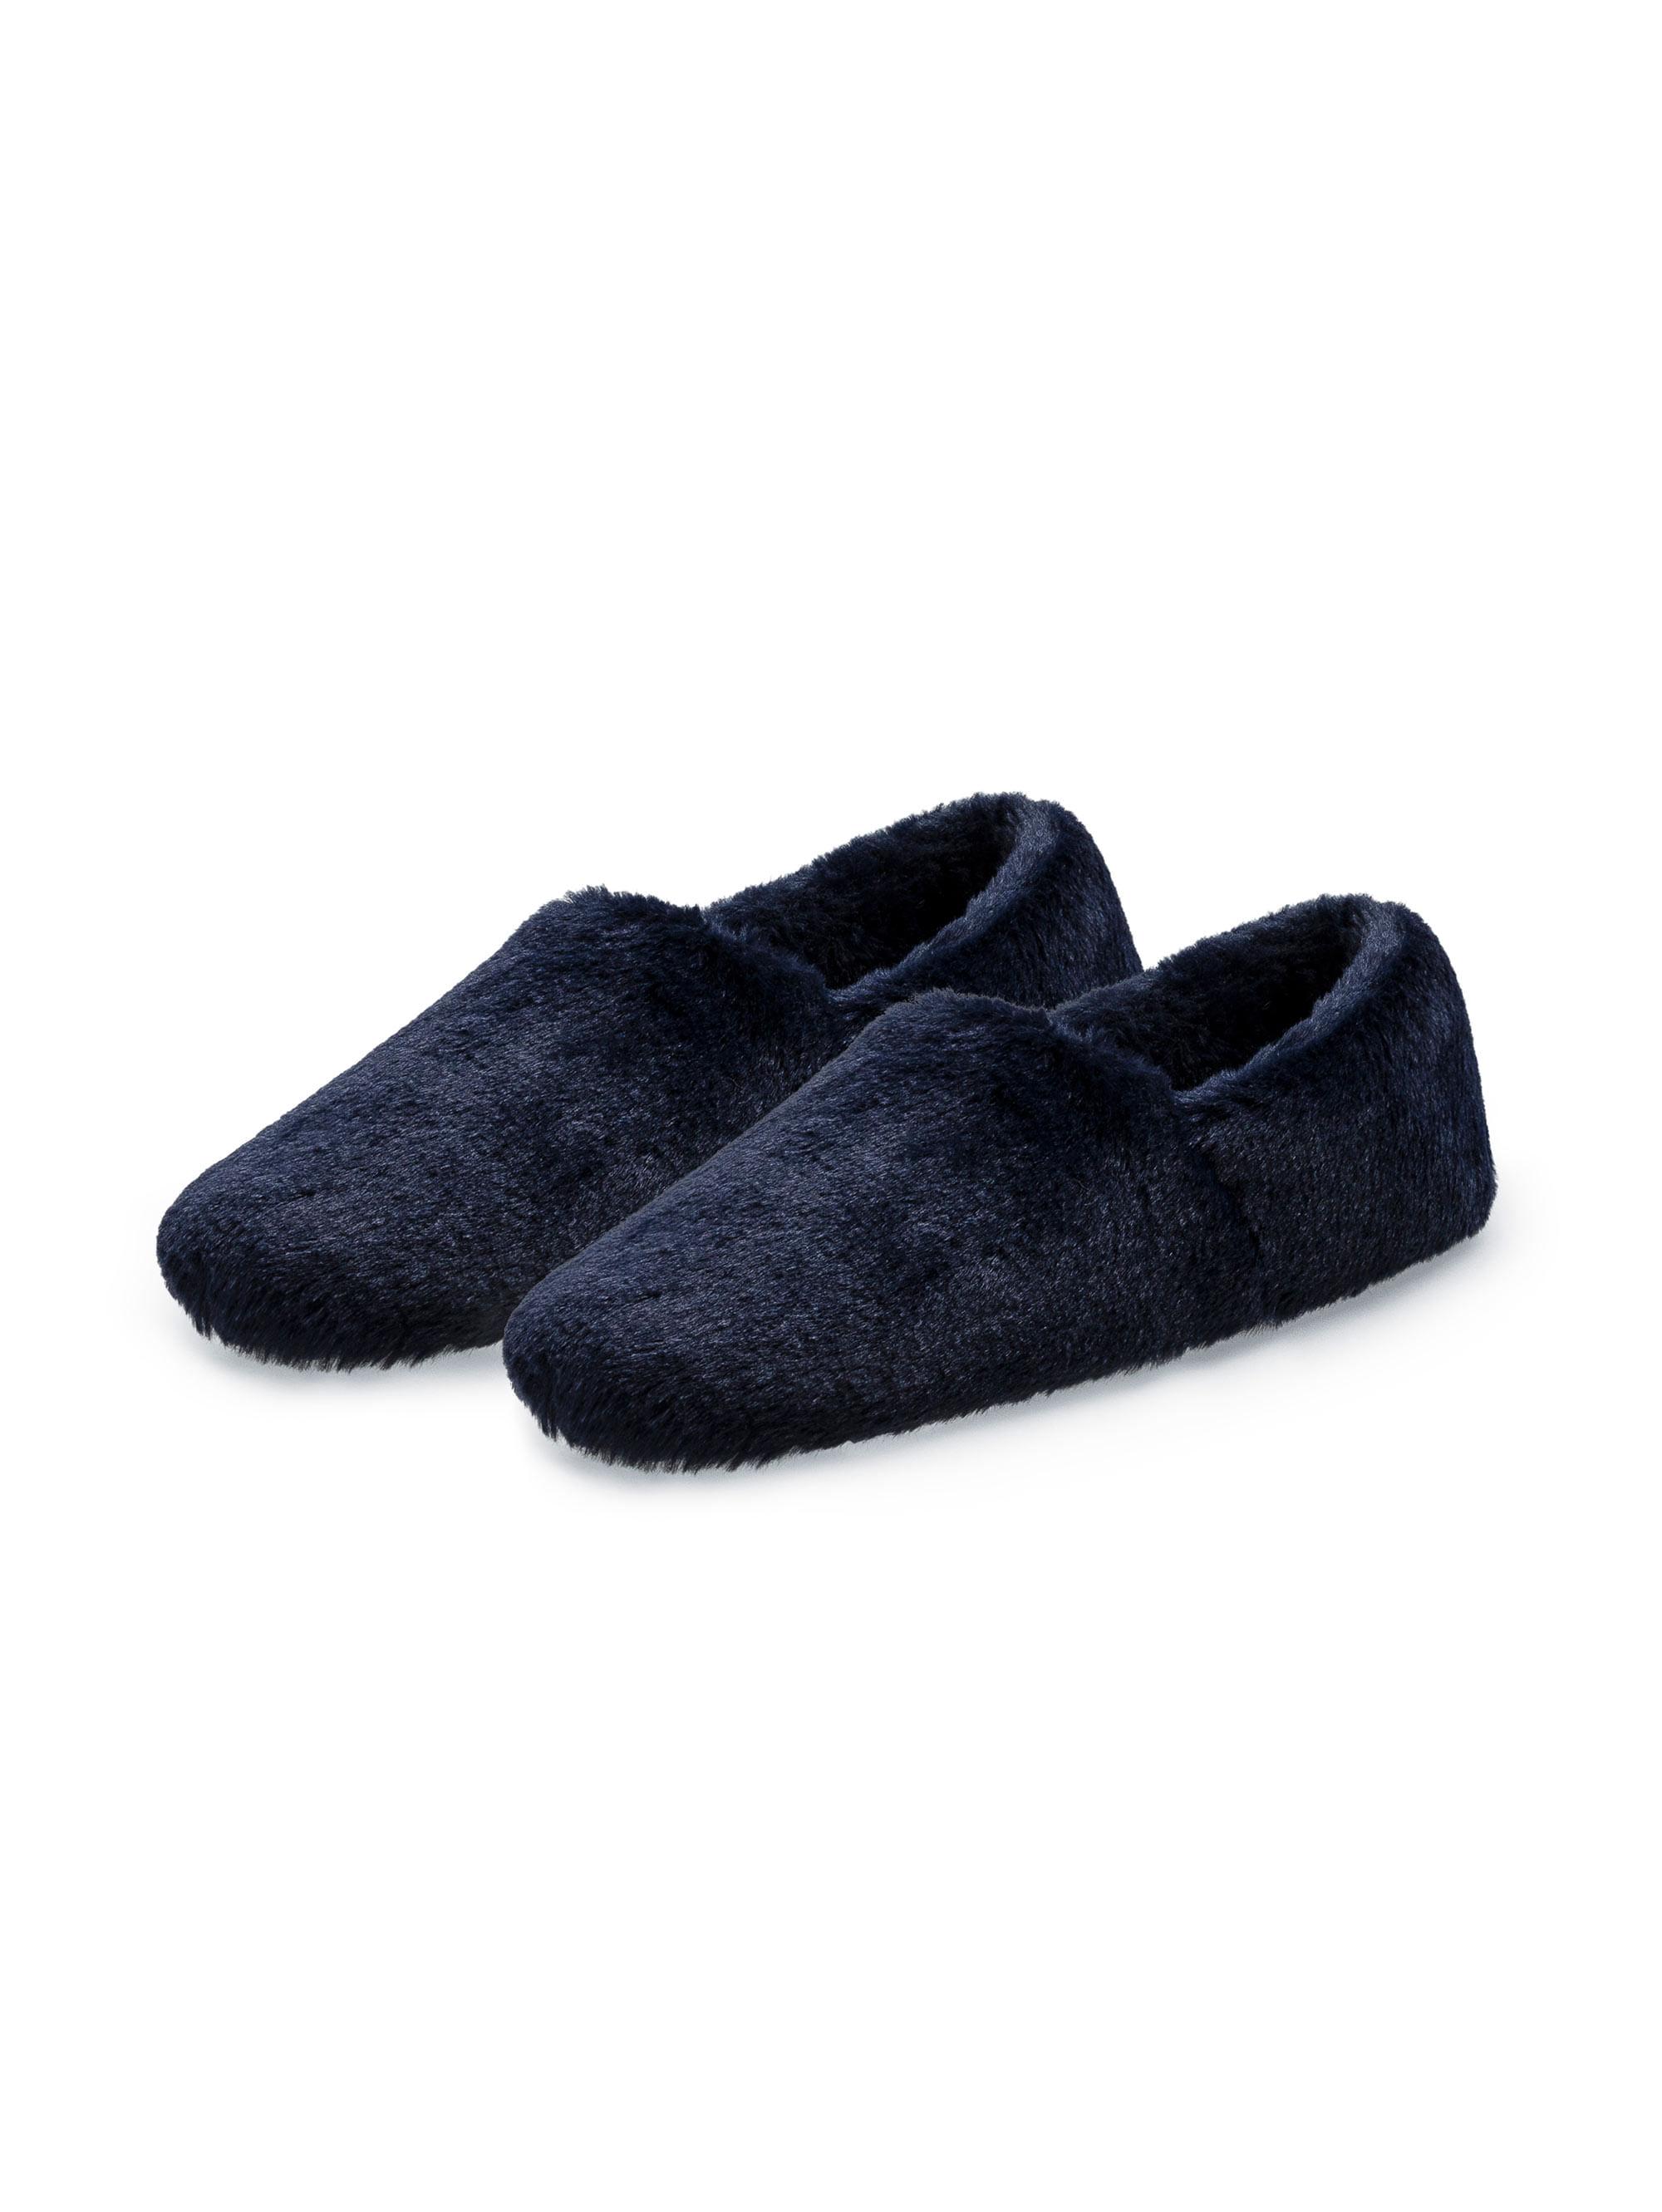 Pantufa-Blue-Basic-13.02.0057